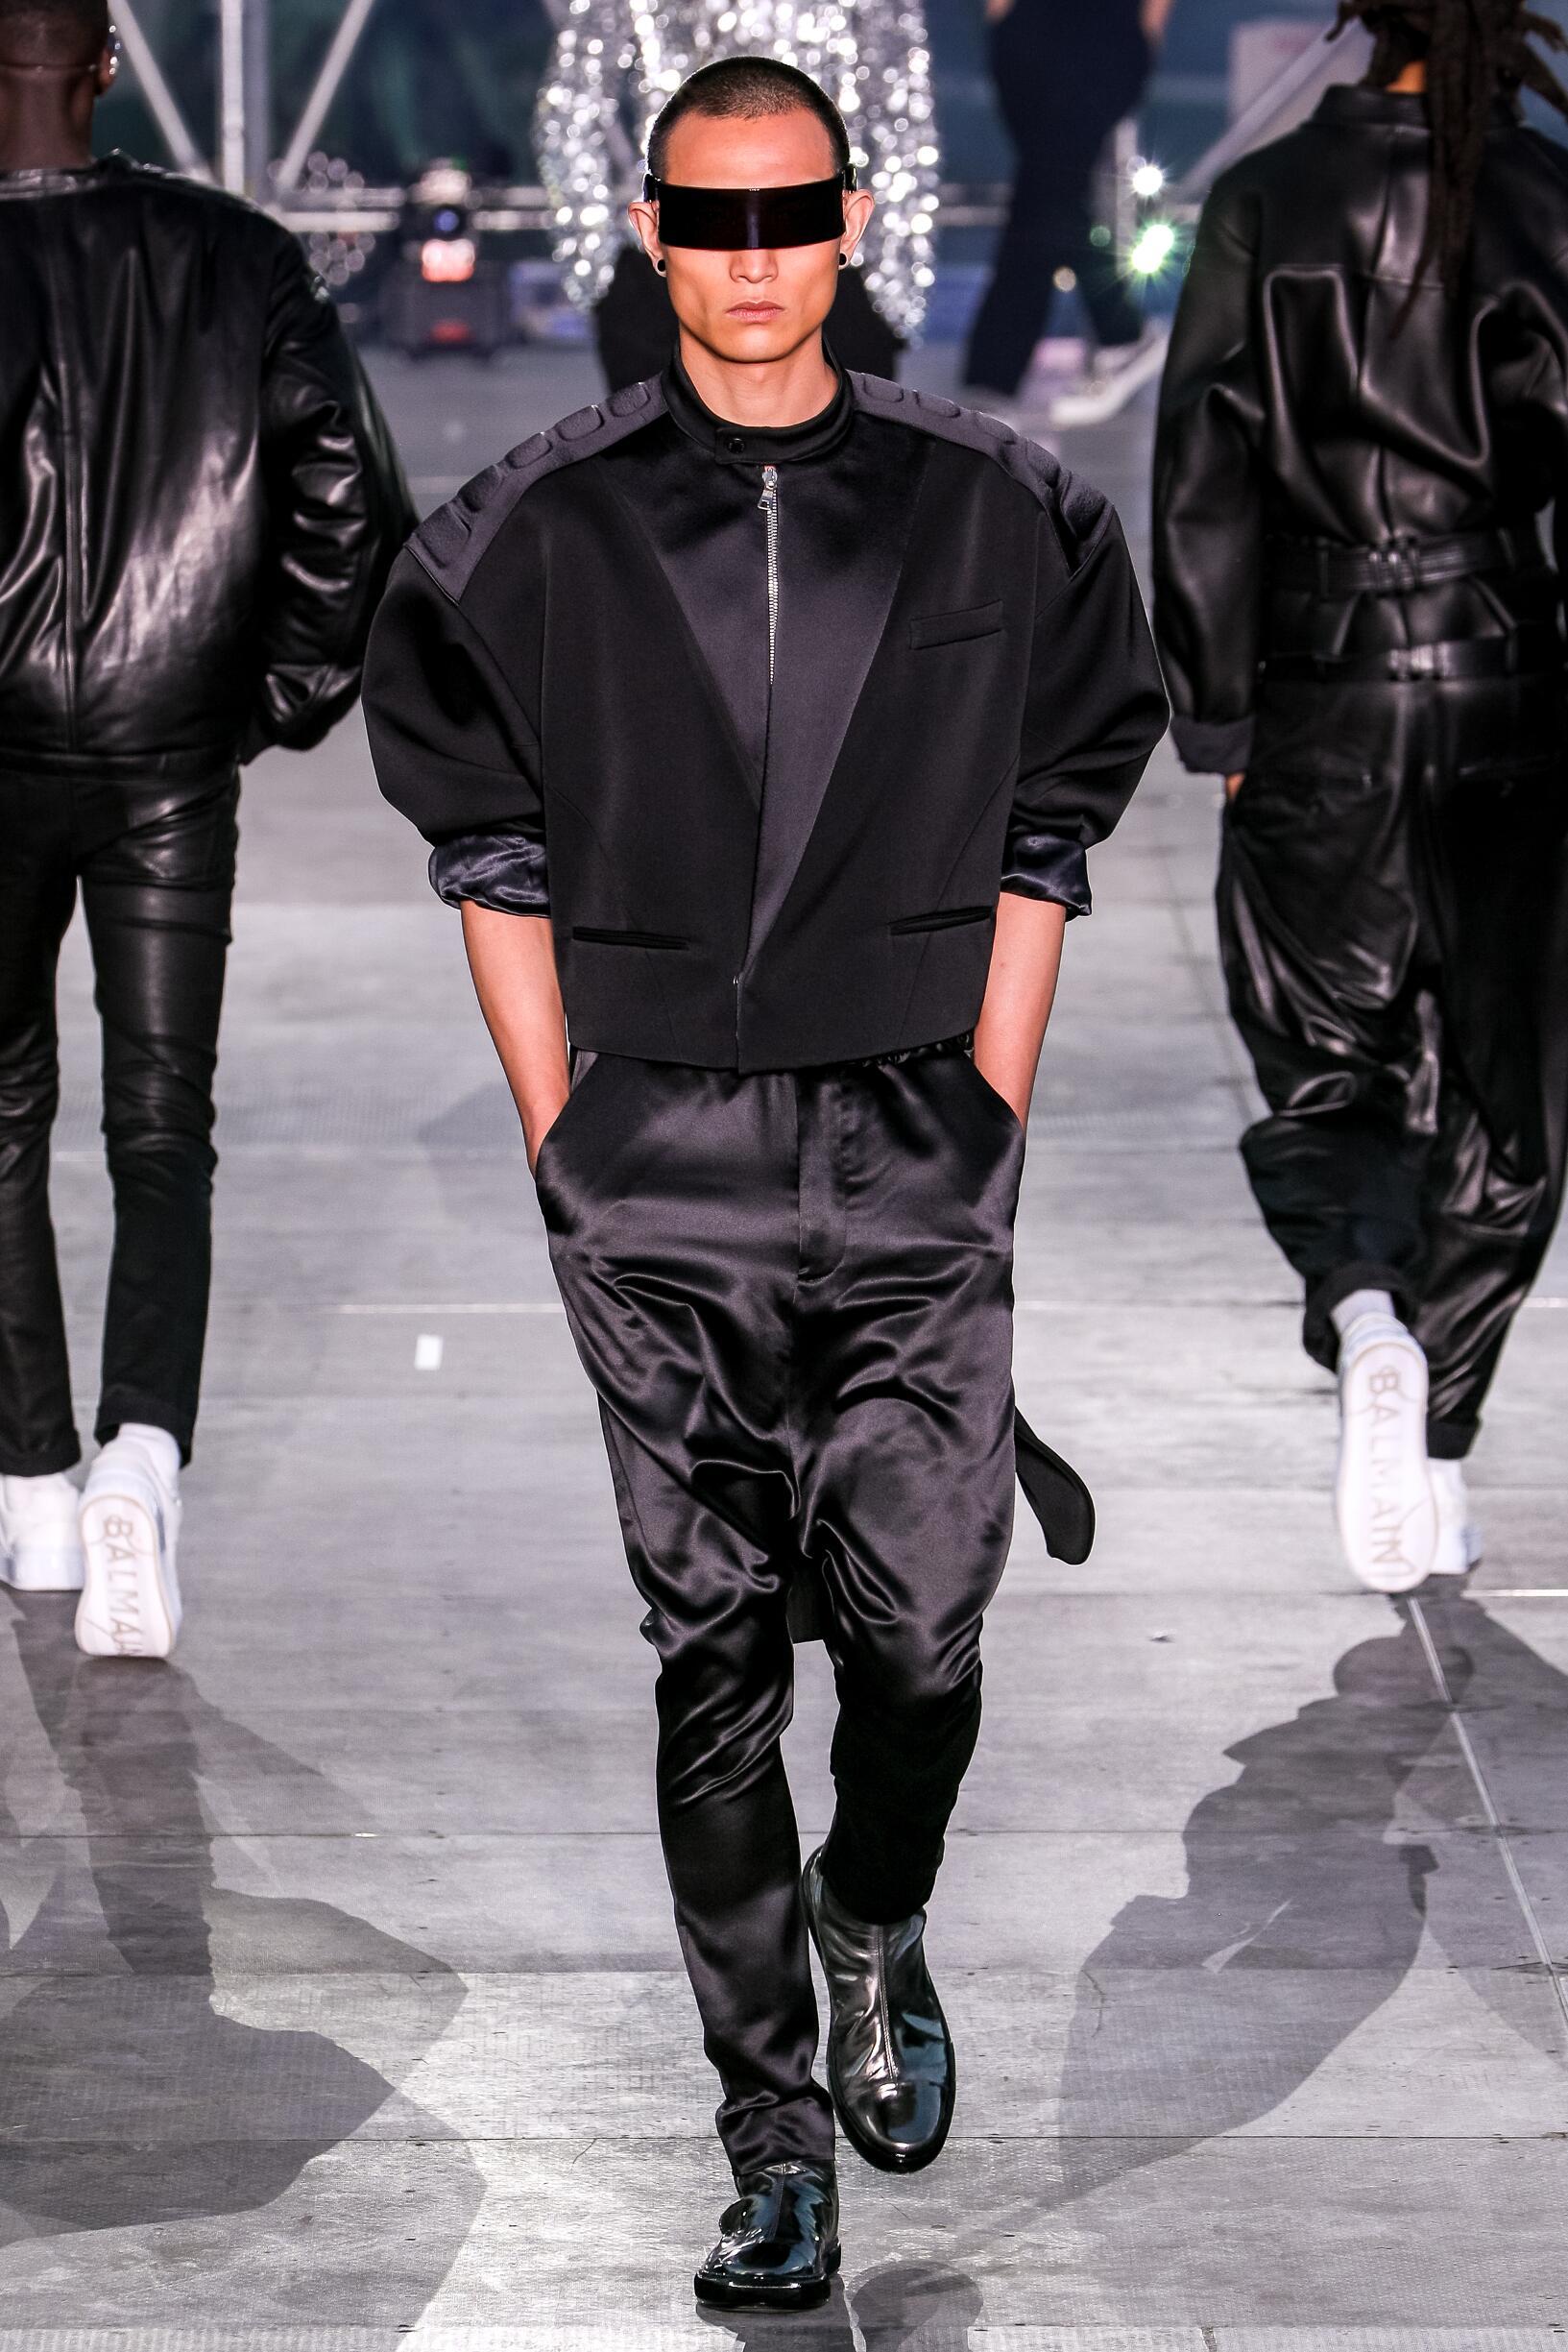 SS 2020 Balmain Show Paris Fashion Week Menswear